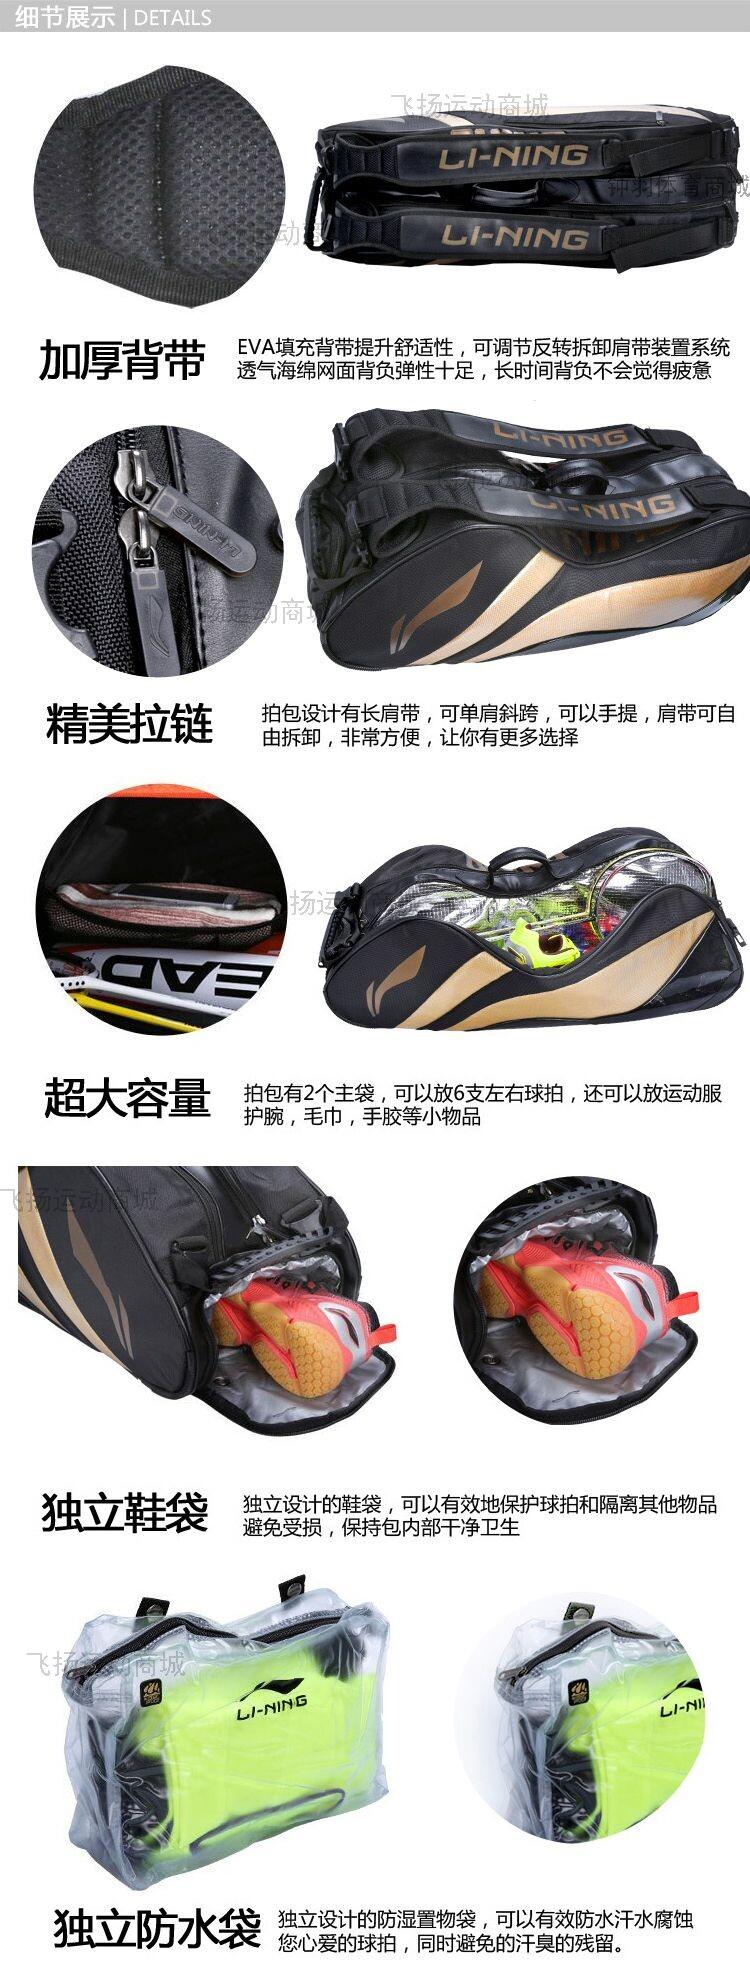 Li-Ning Chen Long Mens Racket Bag | Single Shoulder 6 Racquet Bag